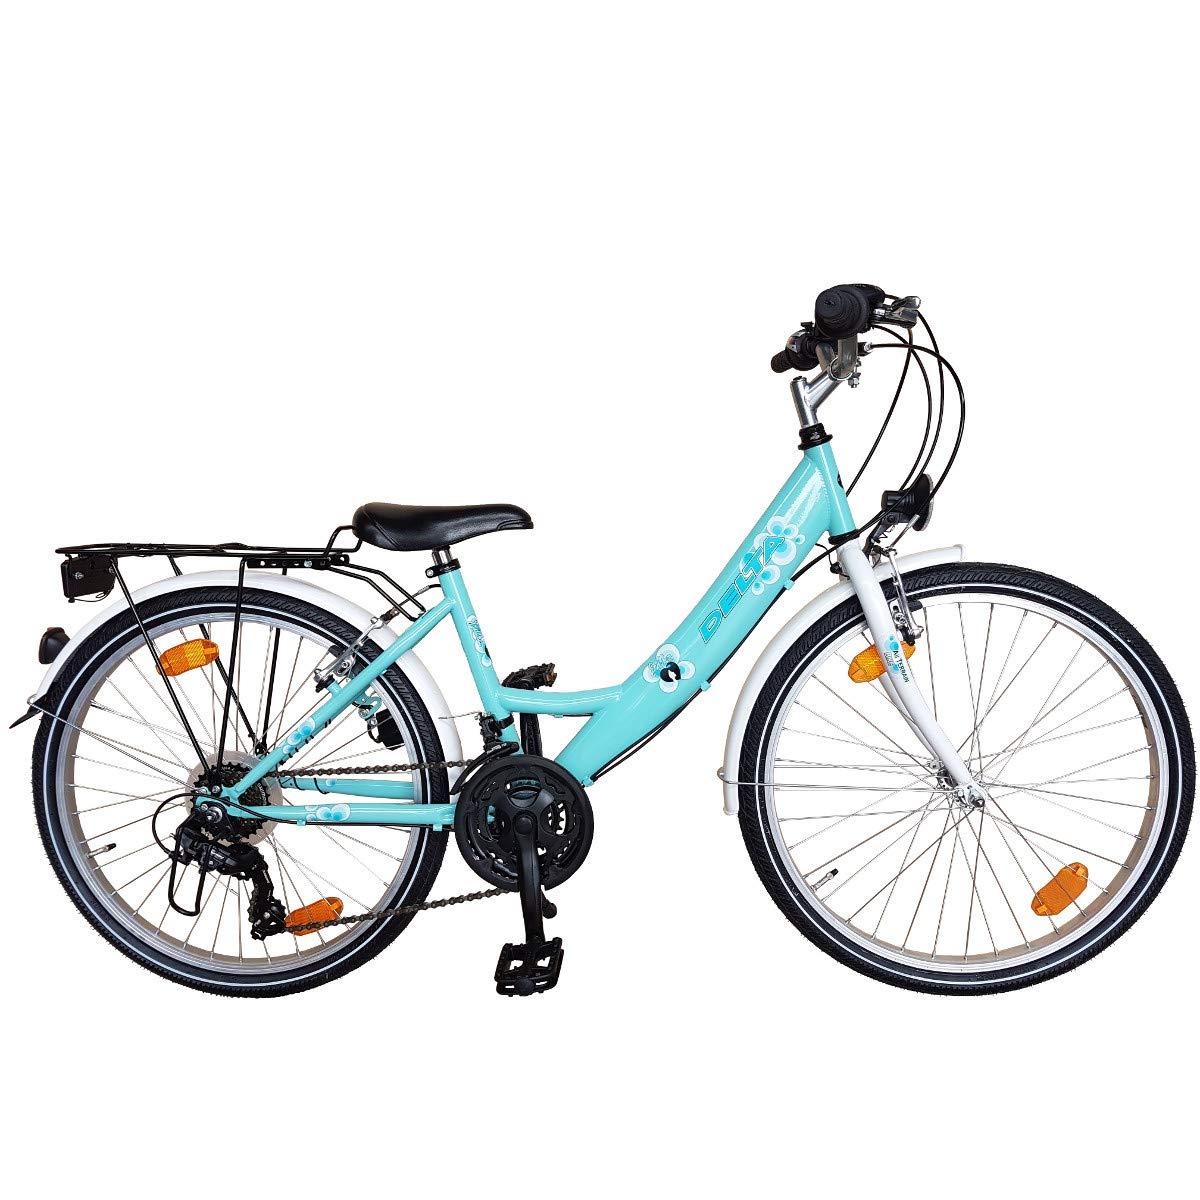 Fahrrad Kinderfahrrad 24 Zoll 18 Gang Shimano STVO Mint Harmoni